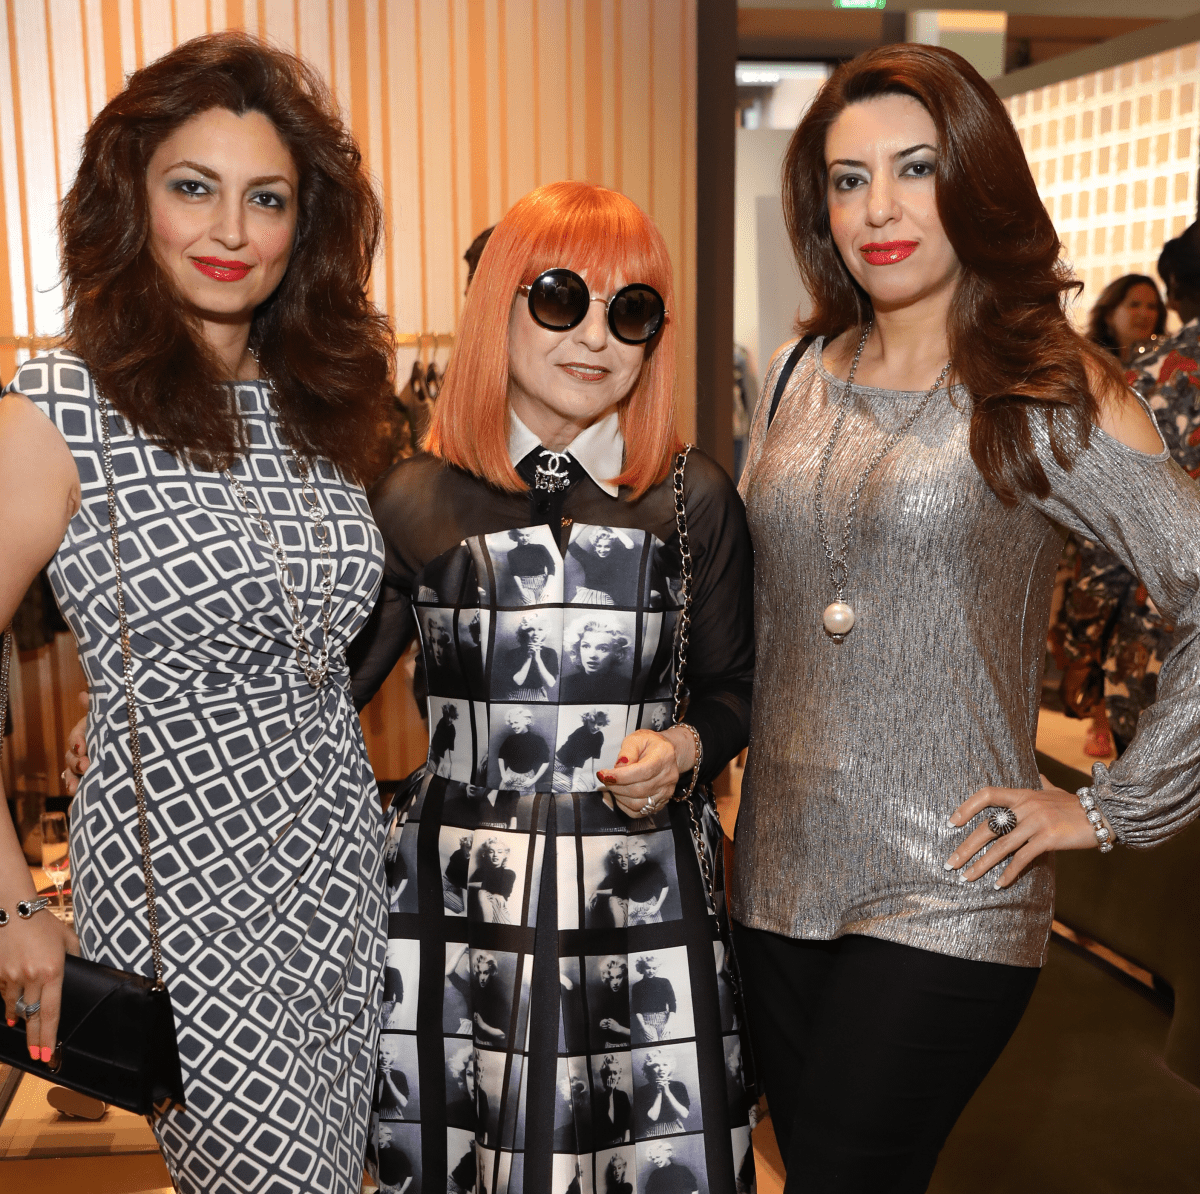 Mahzad Mohajer, Elina Htun, Dr. Parissa Mohajer at Houston Grand Opera party at The Webster